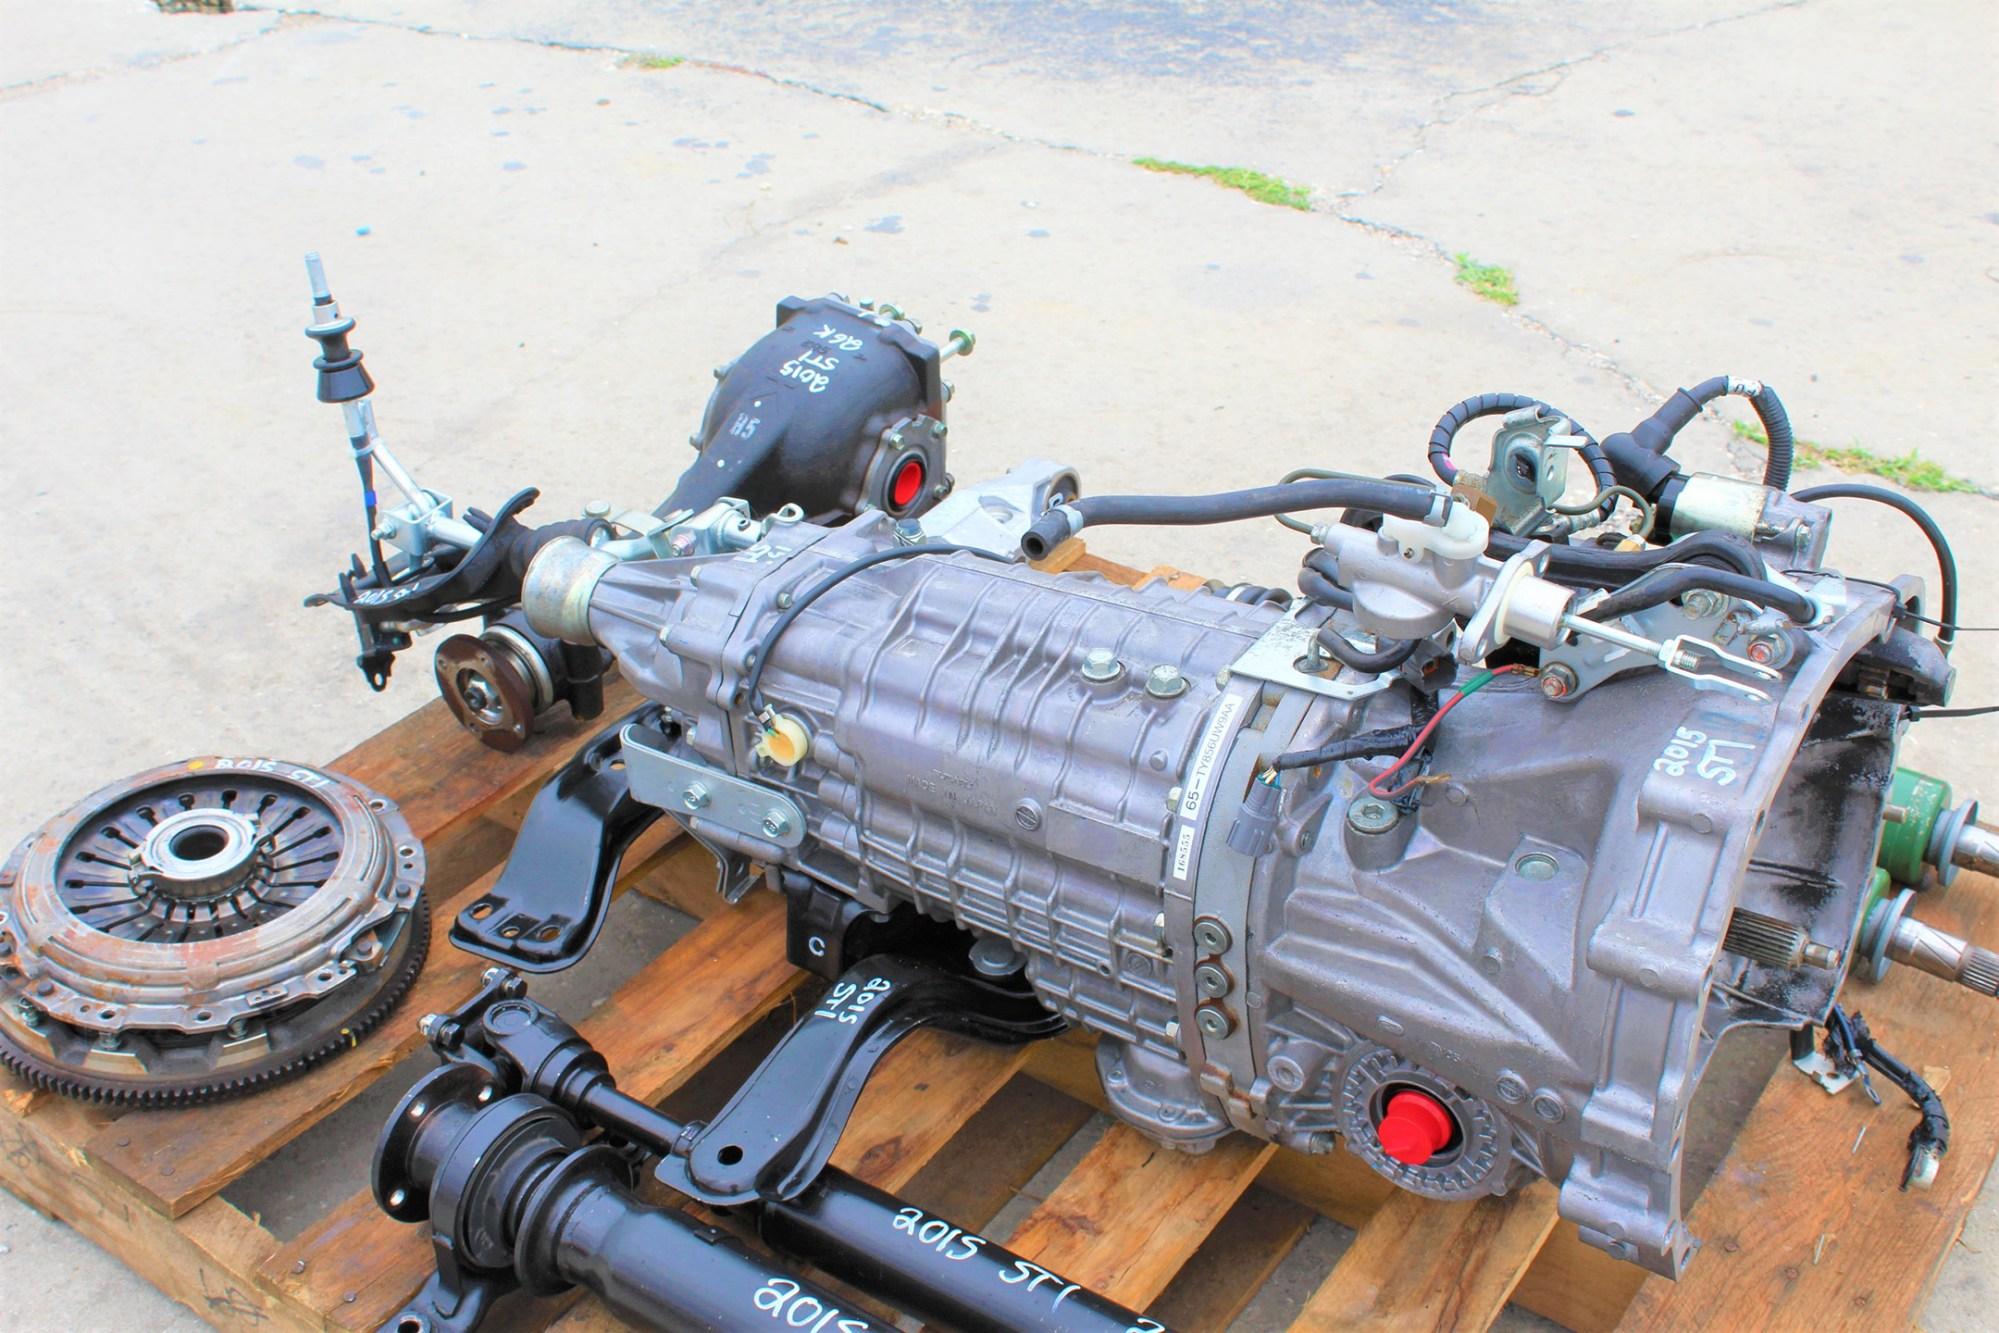 hight resolution of 2015 subaru impreza wrx sti 6 speed transmission swap 26k miles 6mt ej257 direct bolt on package for 08 17 wrx